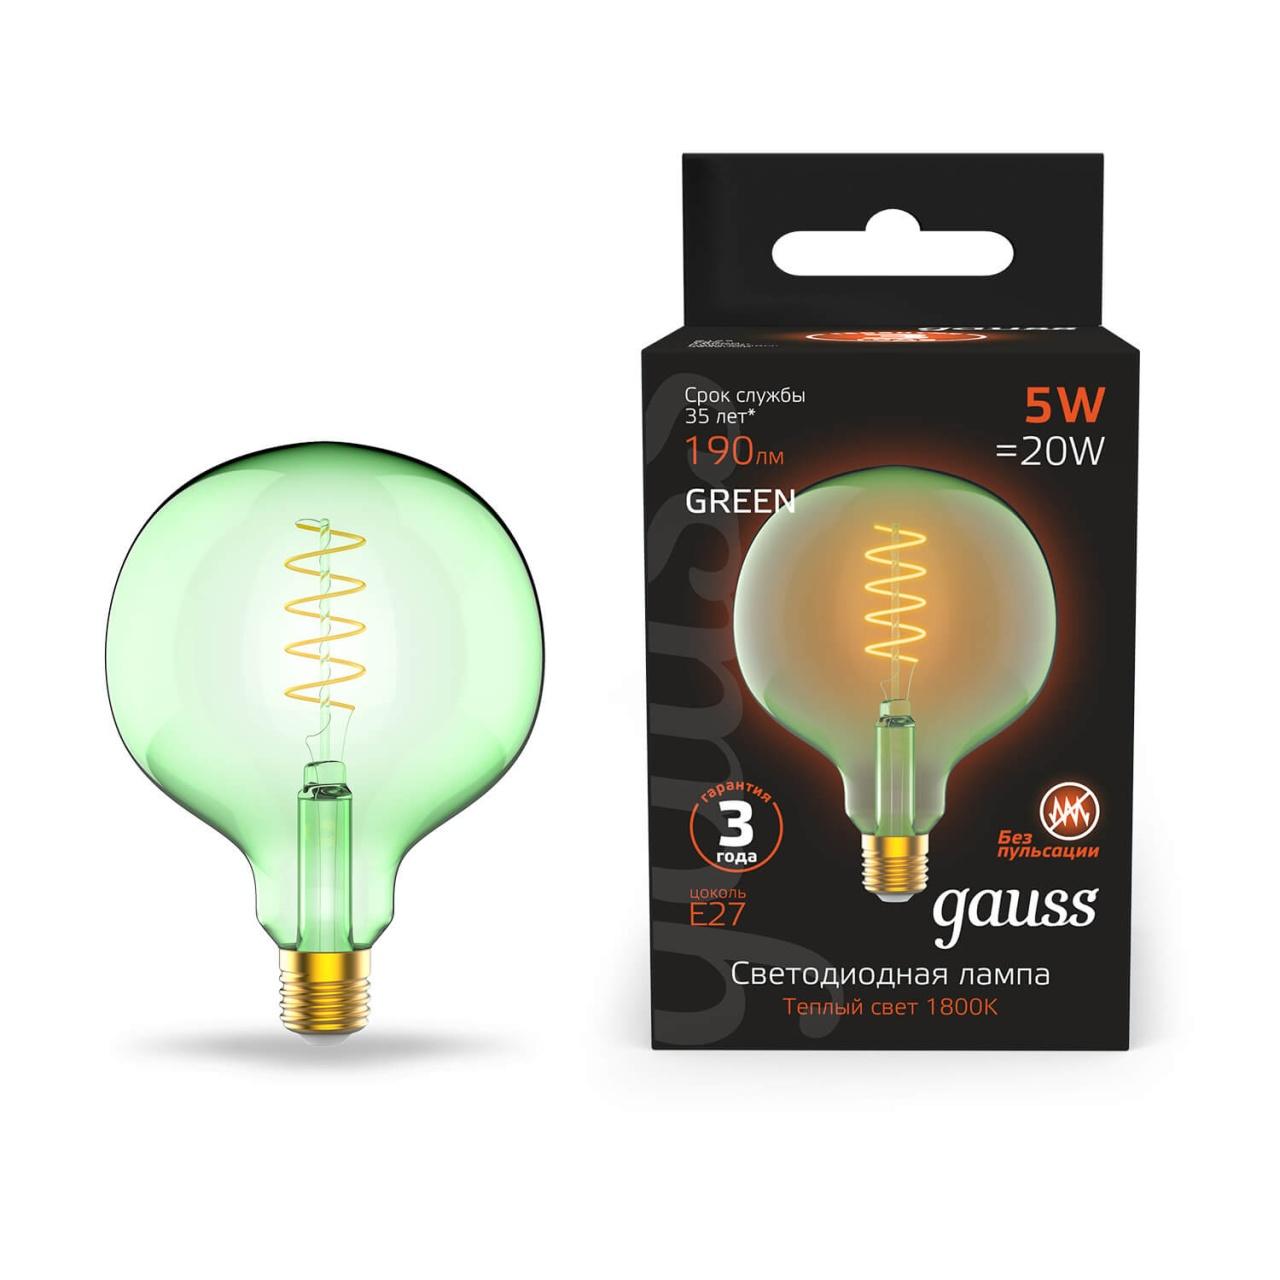 Лампочка Gauss 1012802105 Colored (Диммирование) лампочка gauss 1009802105 colored